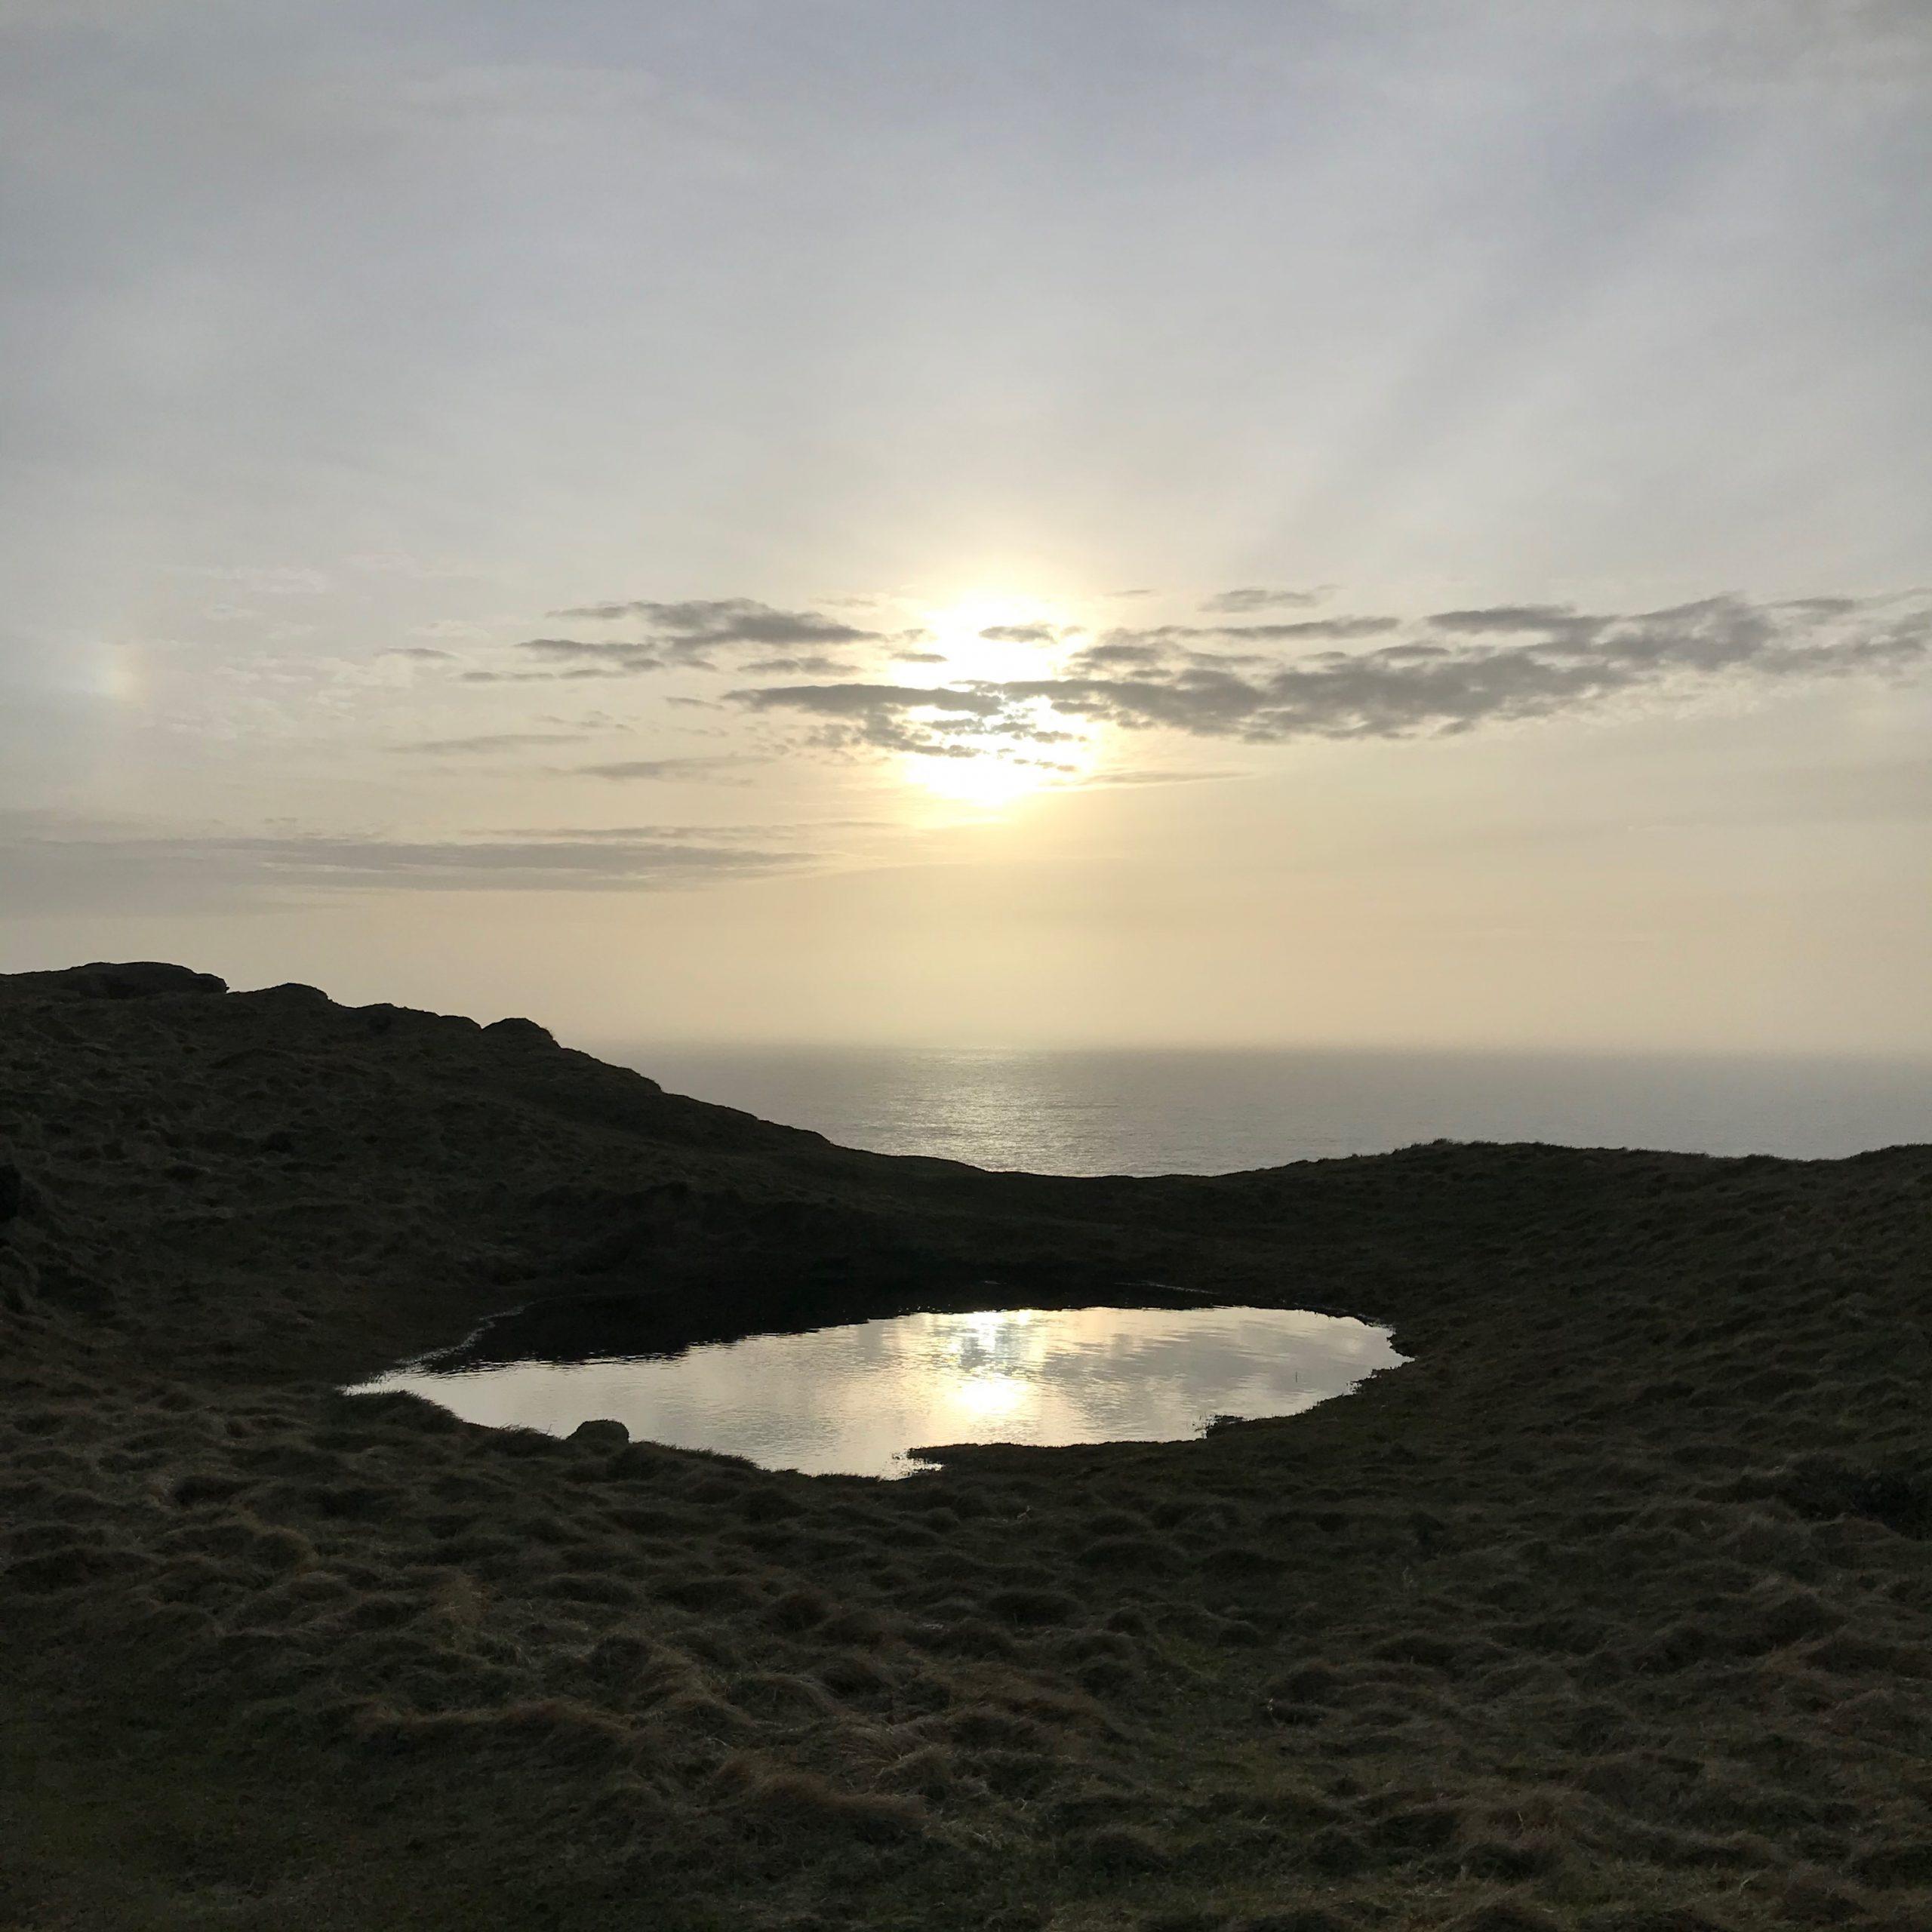 Sun in a pool of water